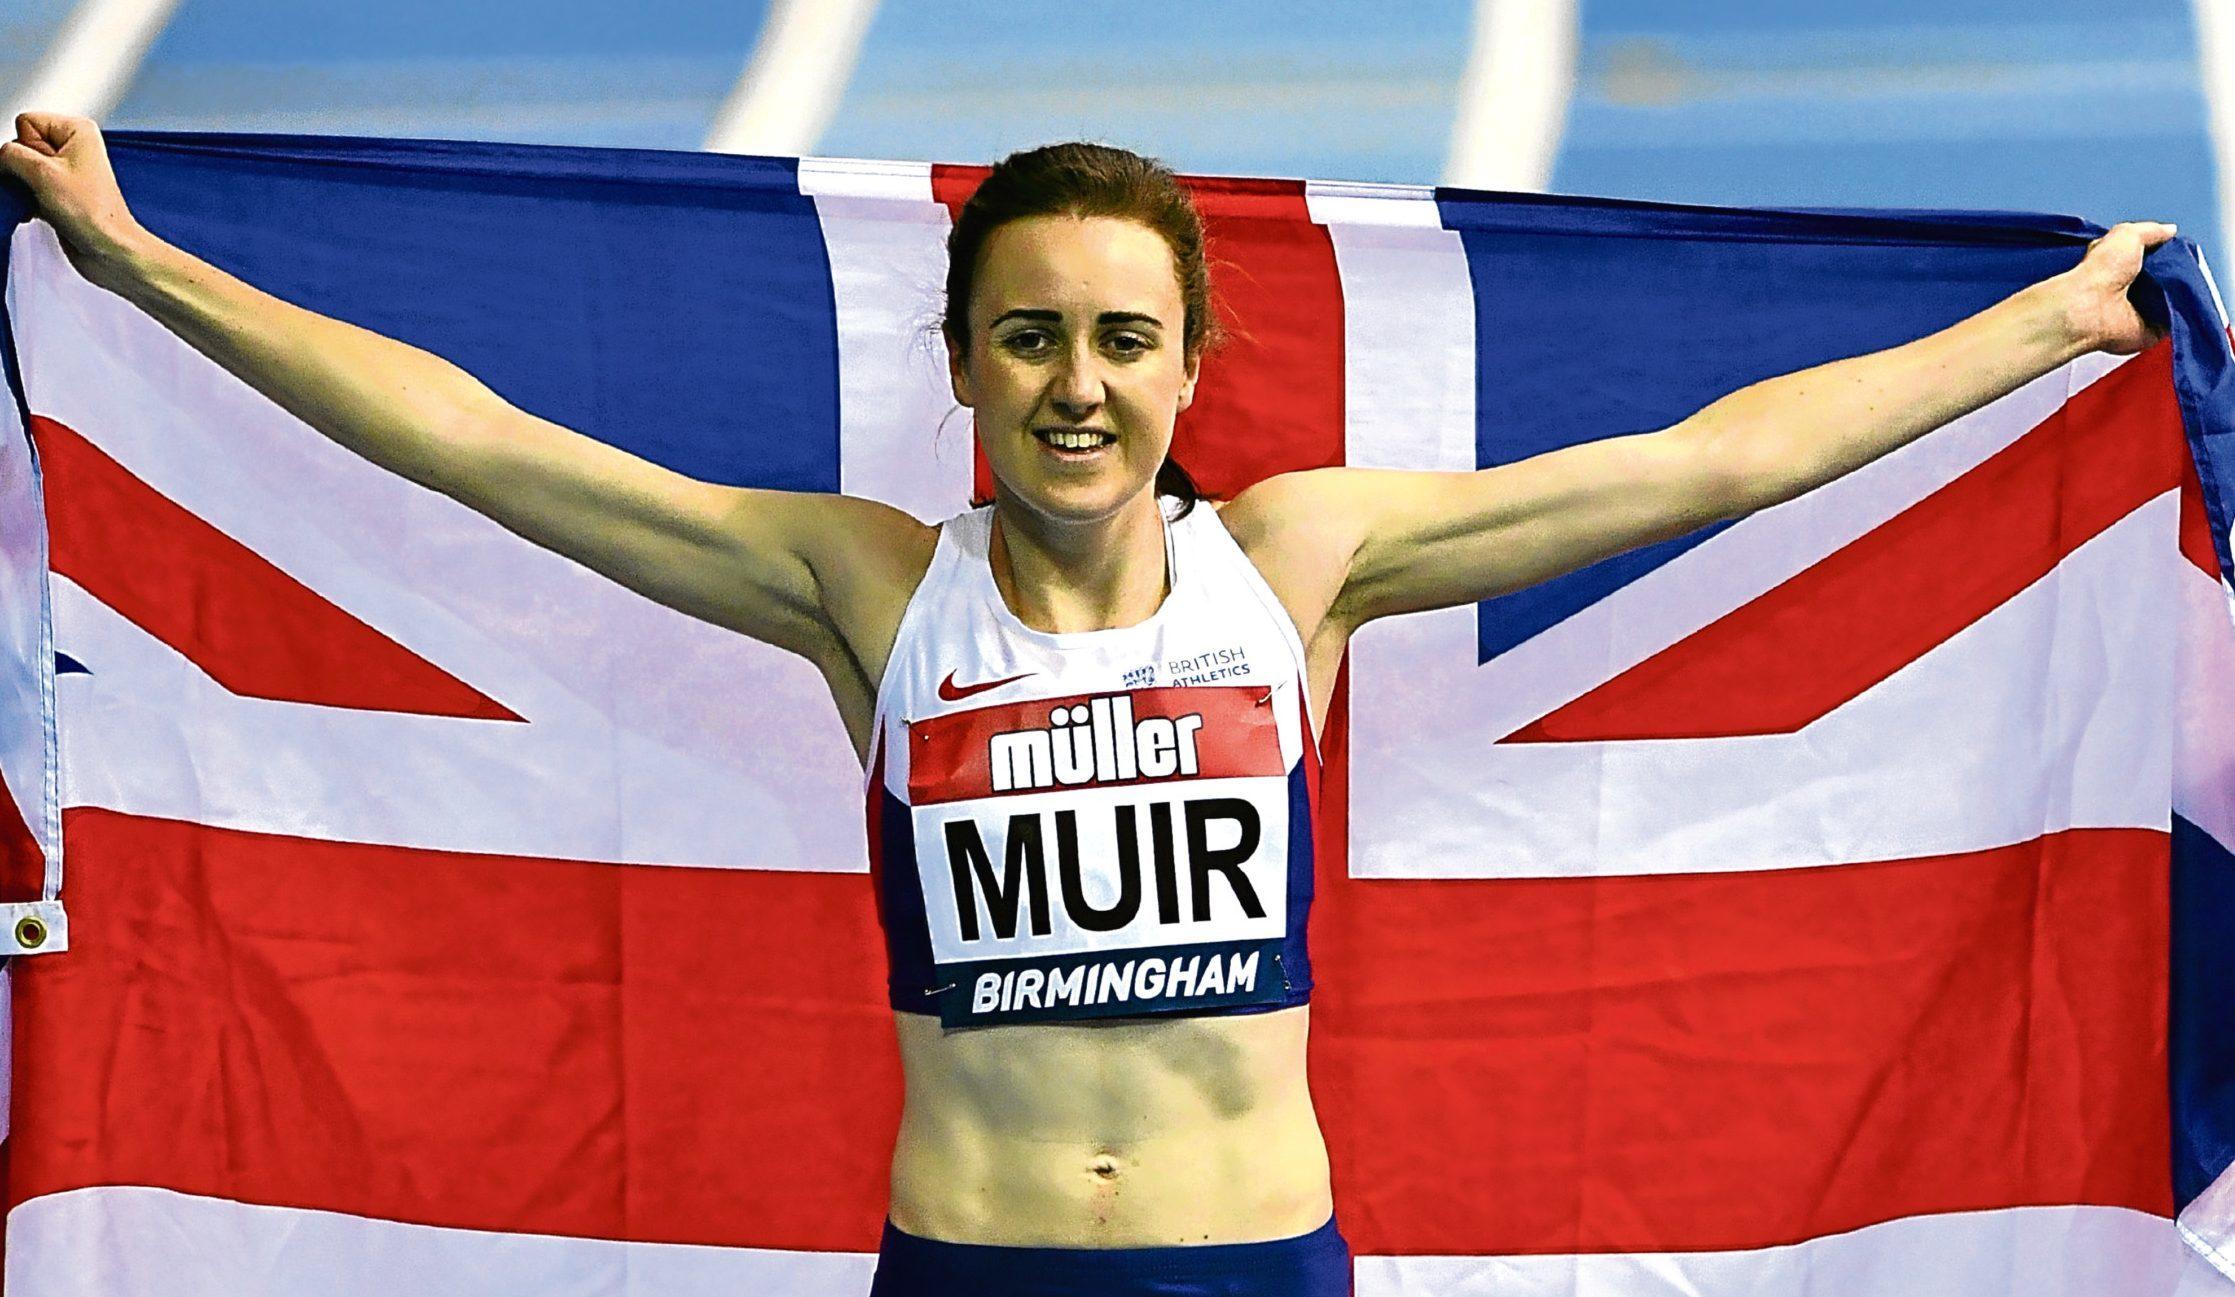 Laura Muir celebrates winning the women's 1000 metres final during the Muller Indoor Grand Prix 2017 (Dan Mullan/Getty Images)